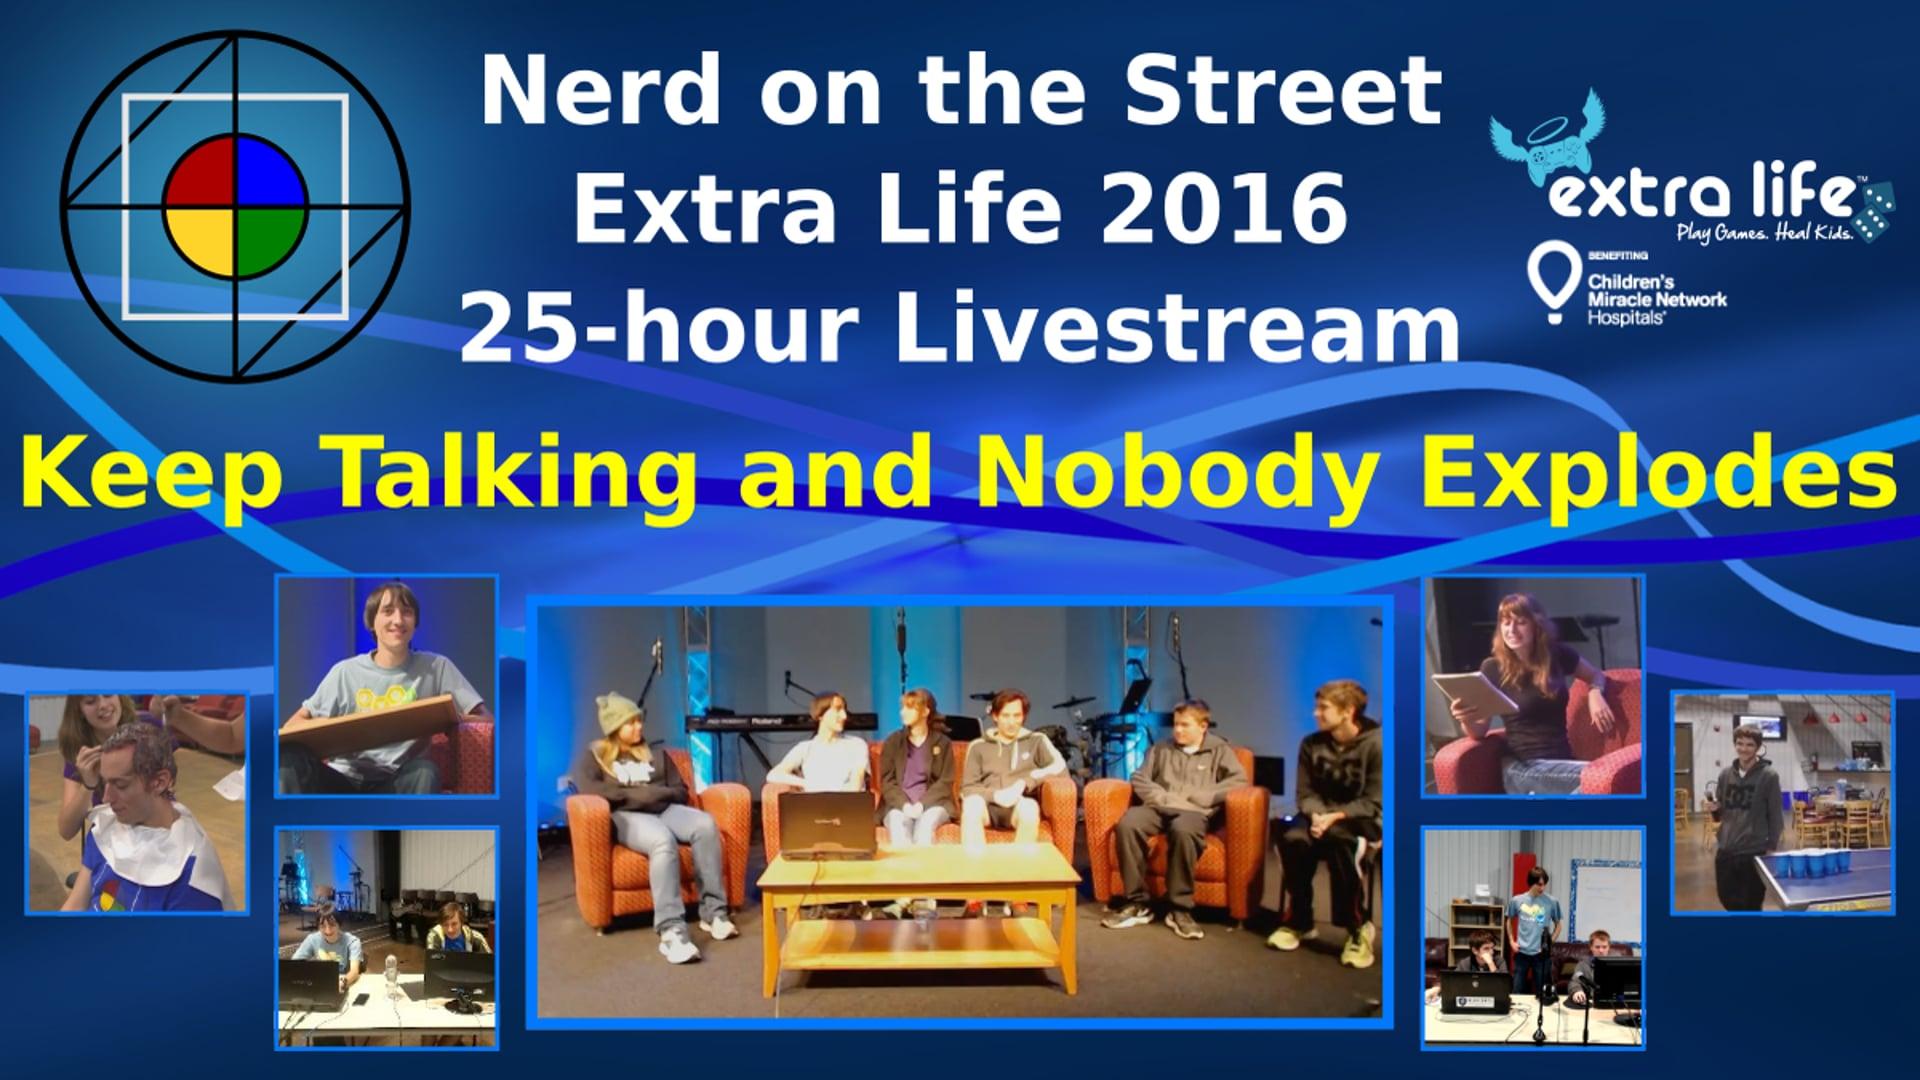 Keep Talking and Nobody Explodes - Extra Life 2016